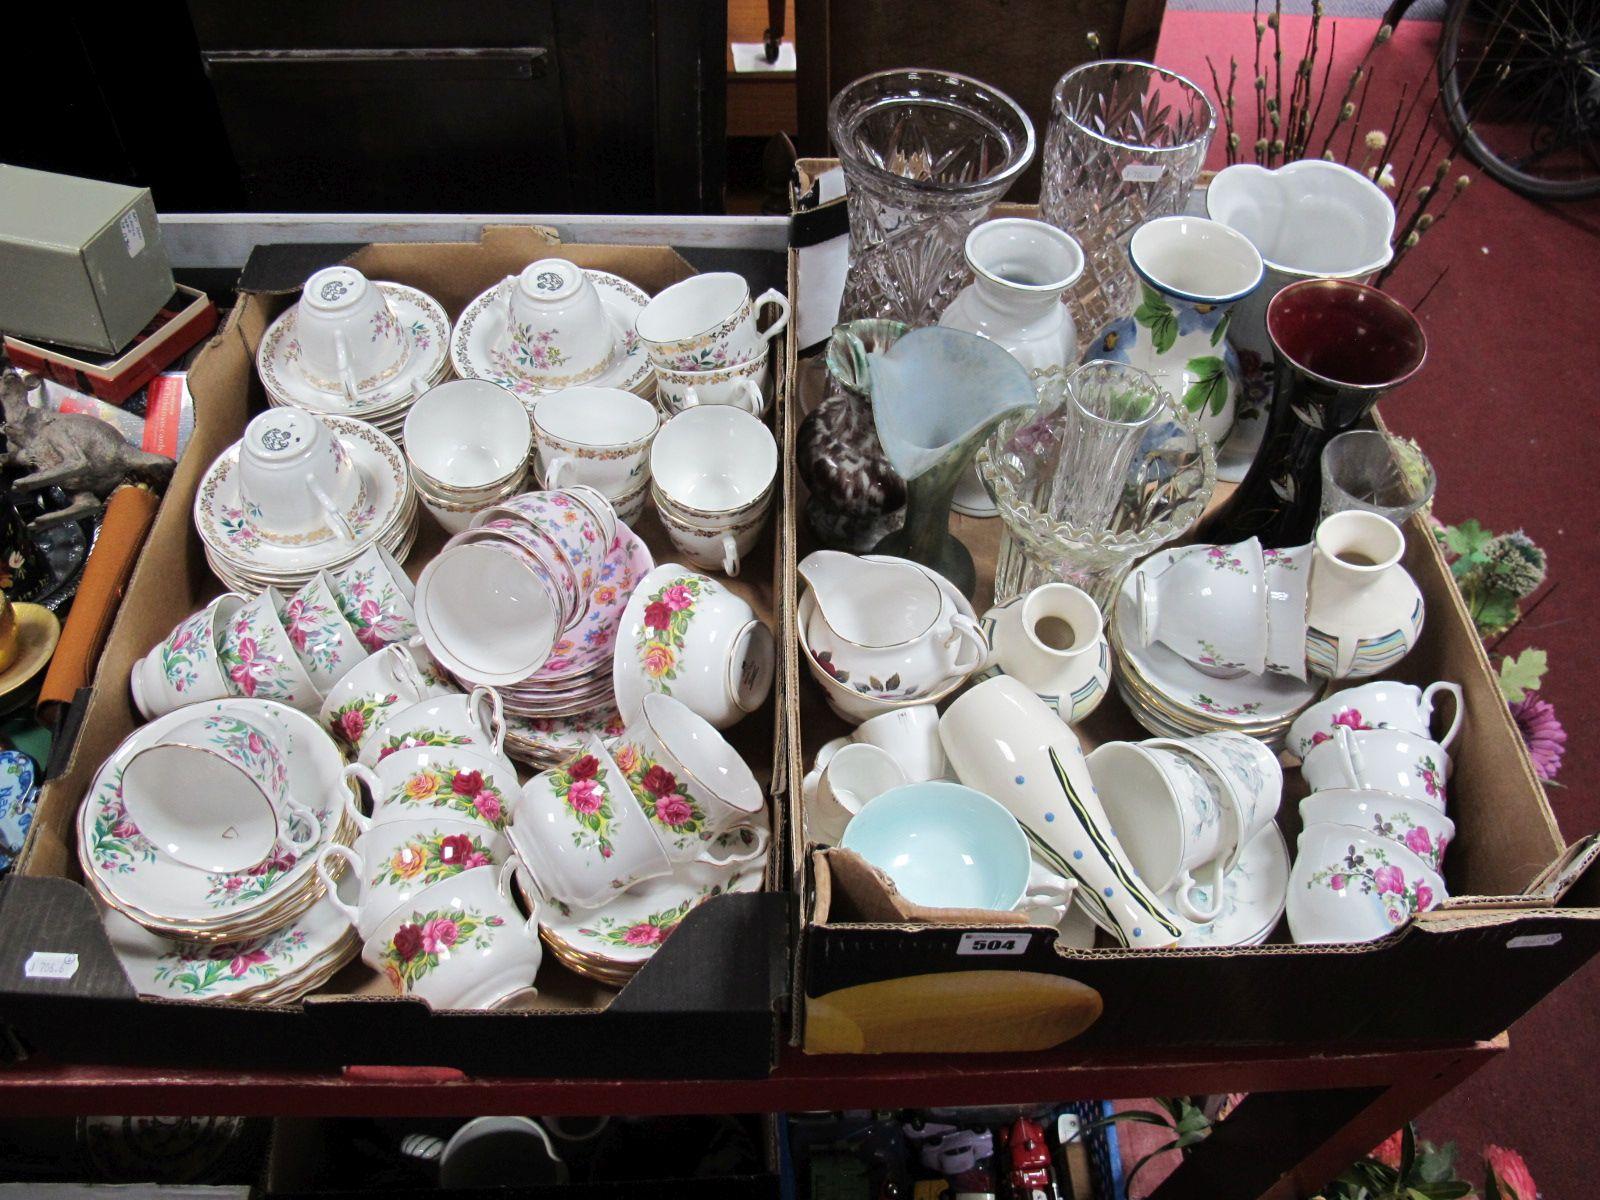 Lot 504 - Royal Grafton China Teawares, lead crystal vase, Hornsea Pottery vases, further teawares, etc.